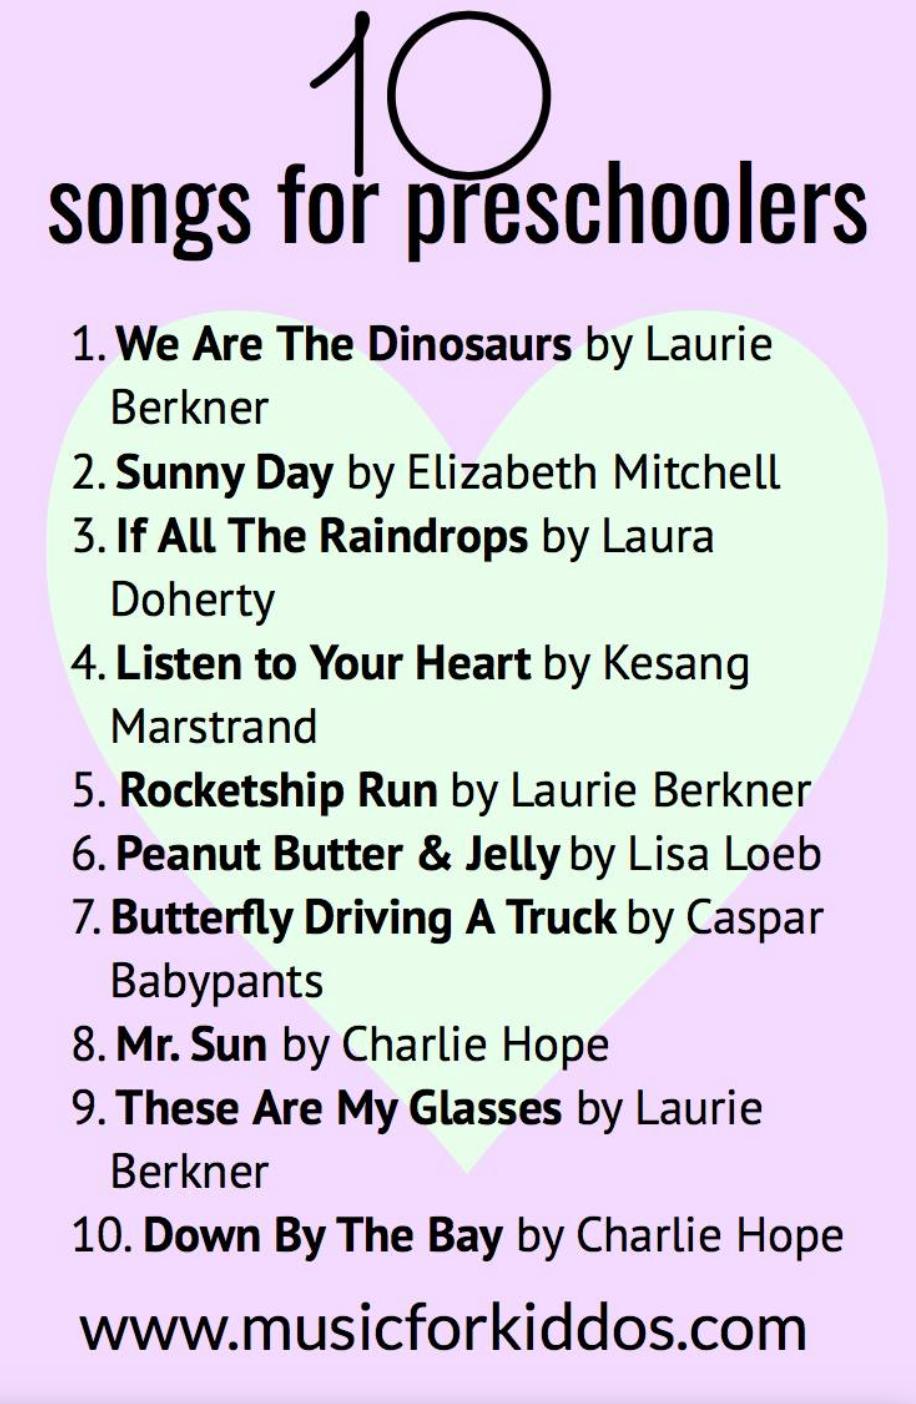 10 songs for preschoolers